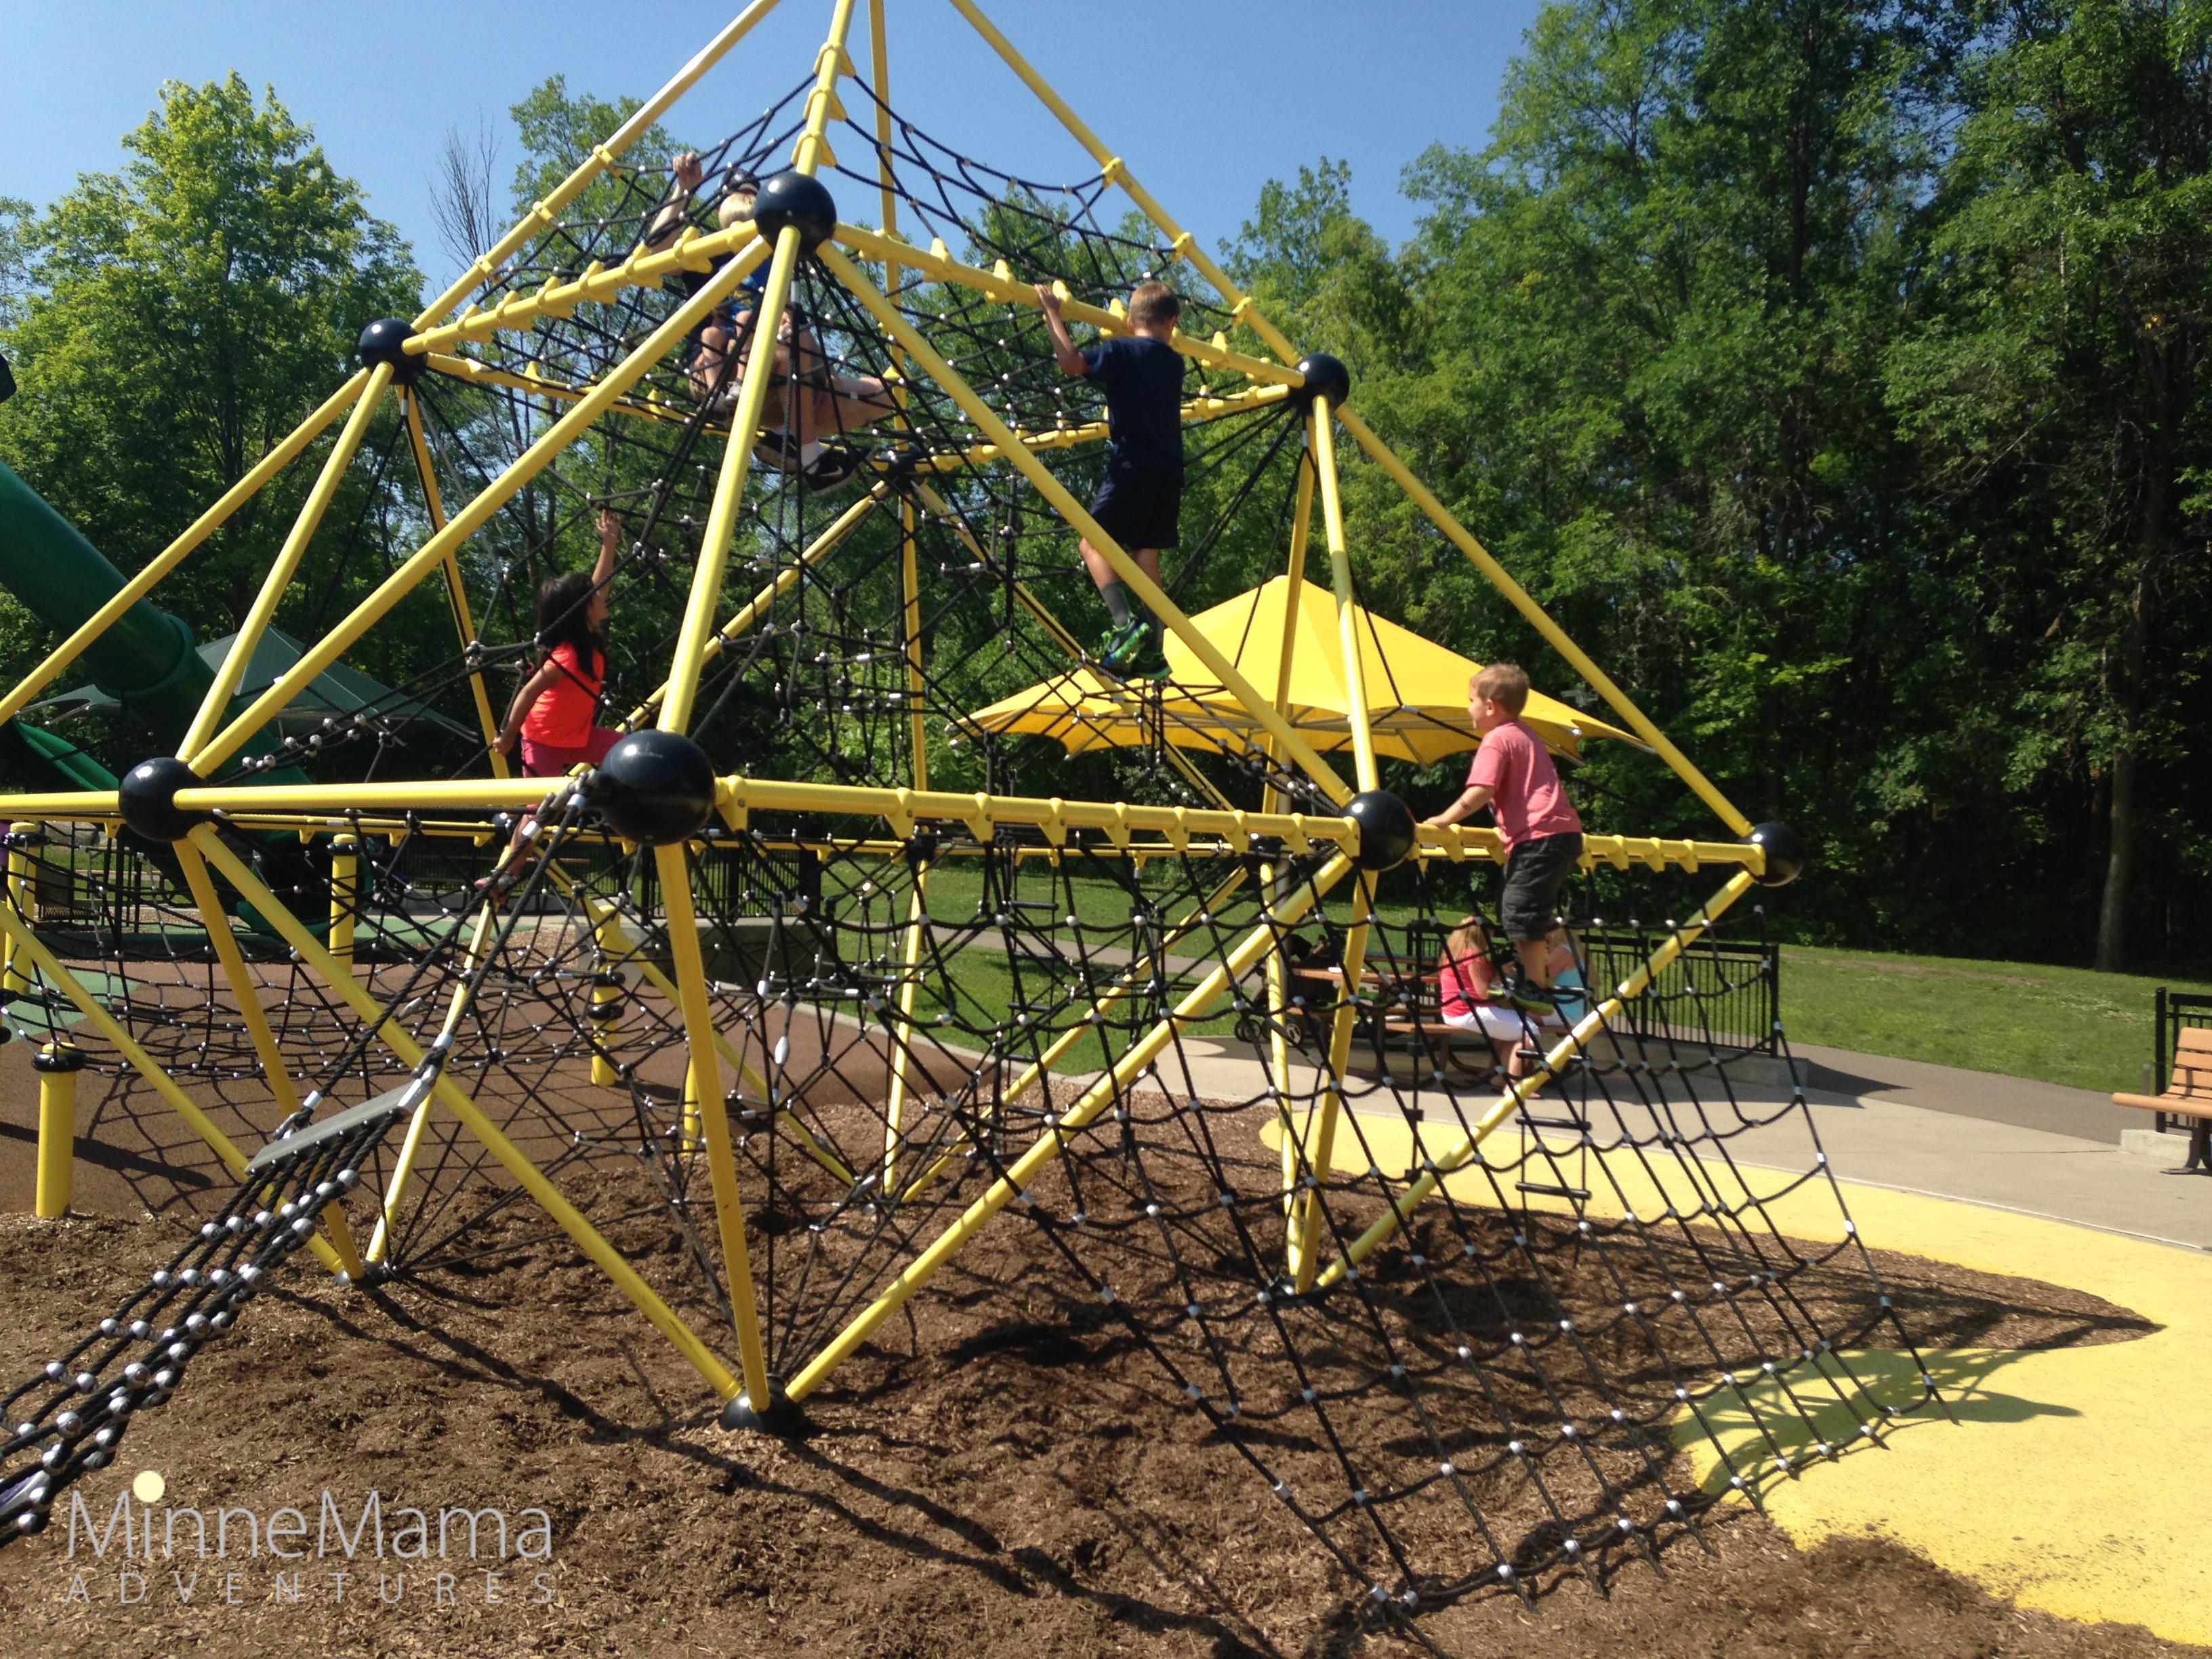 Elm Creek Park Reserve An enormous play area for kids